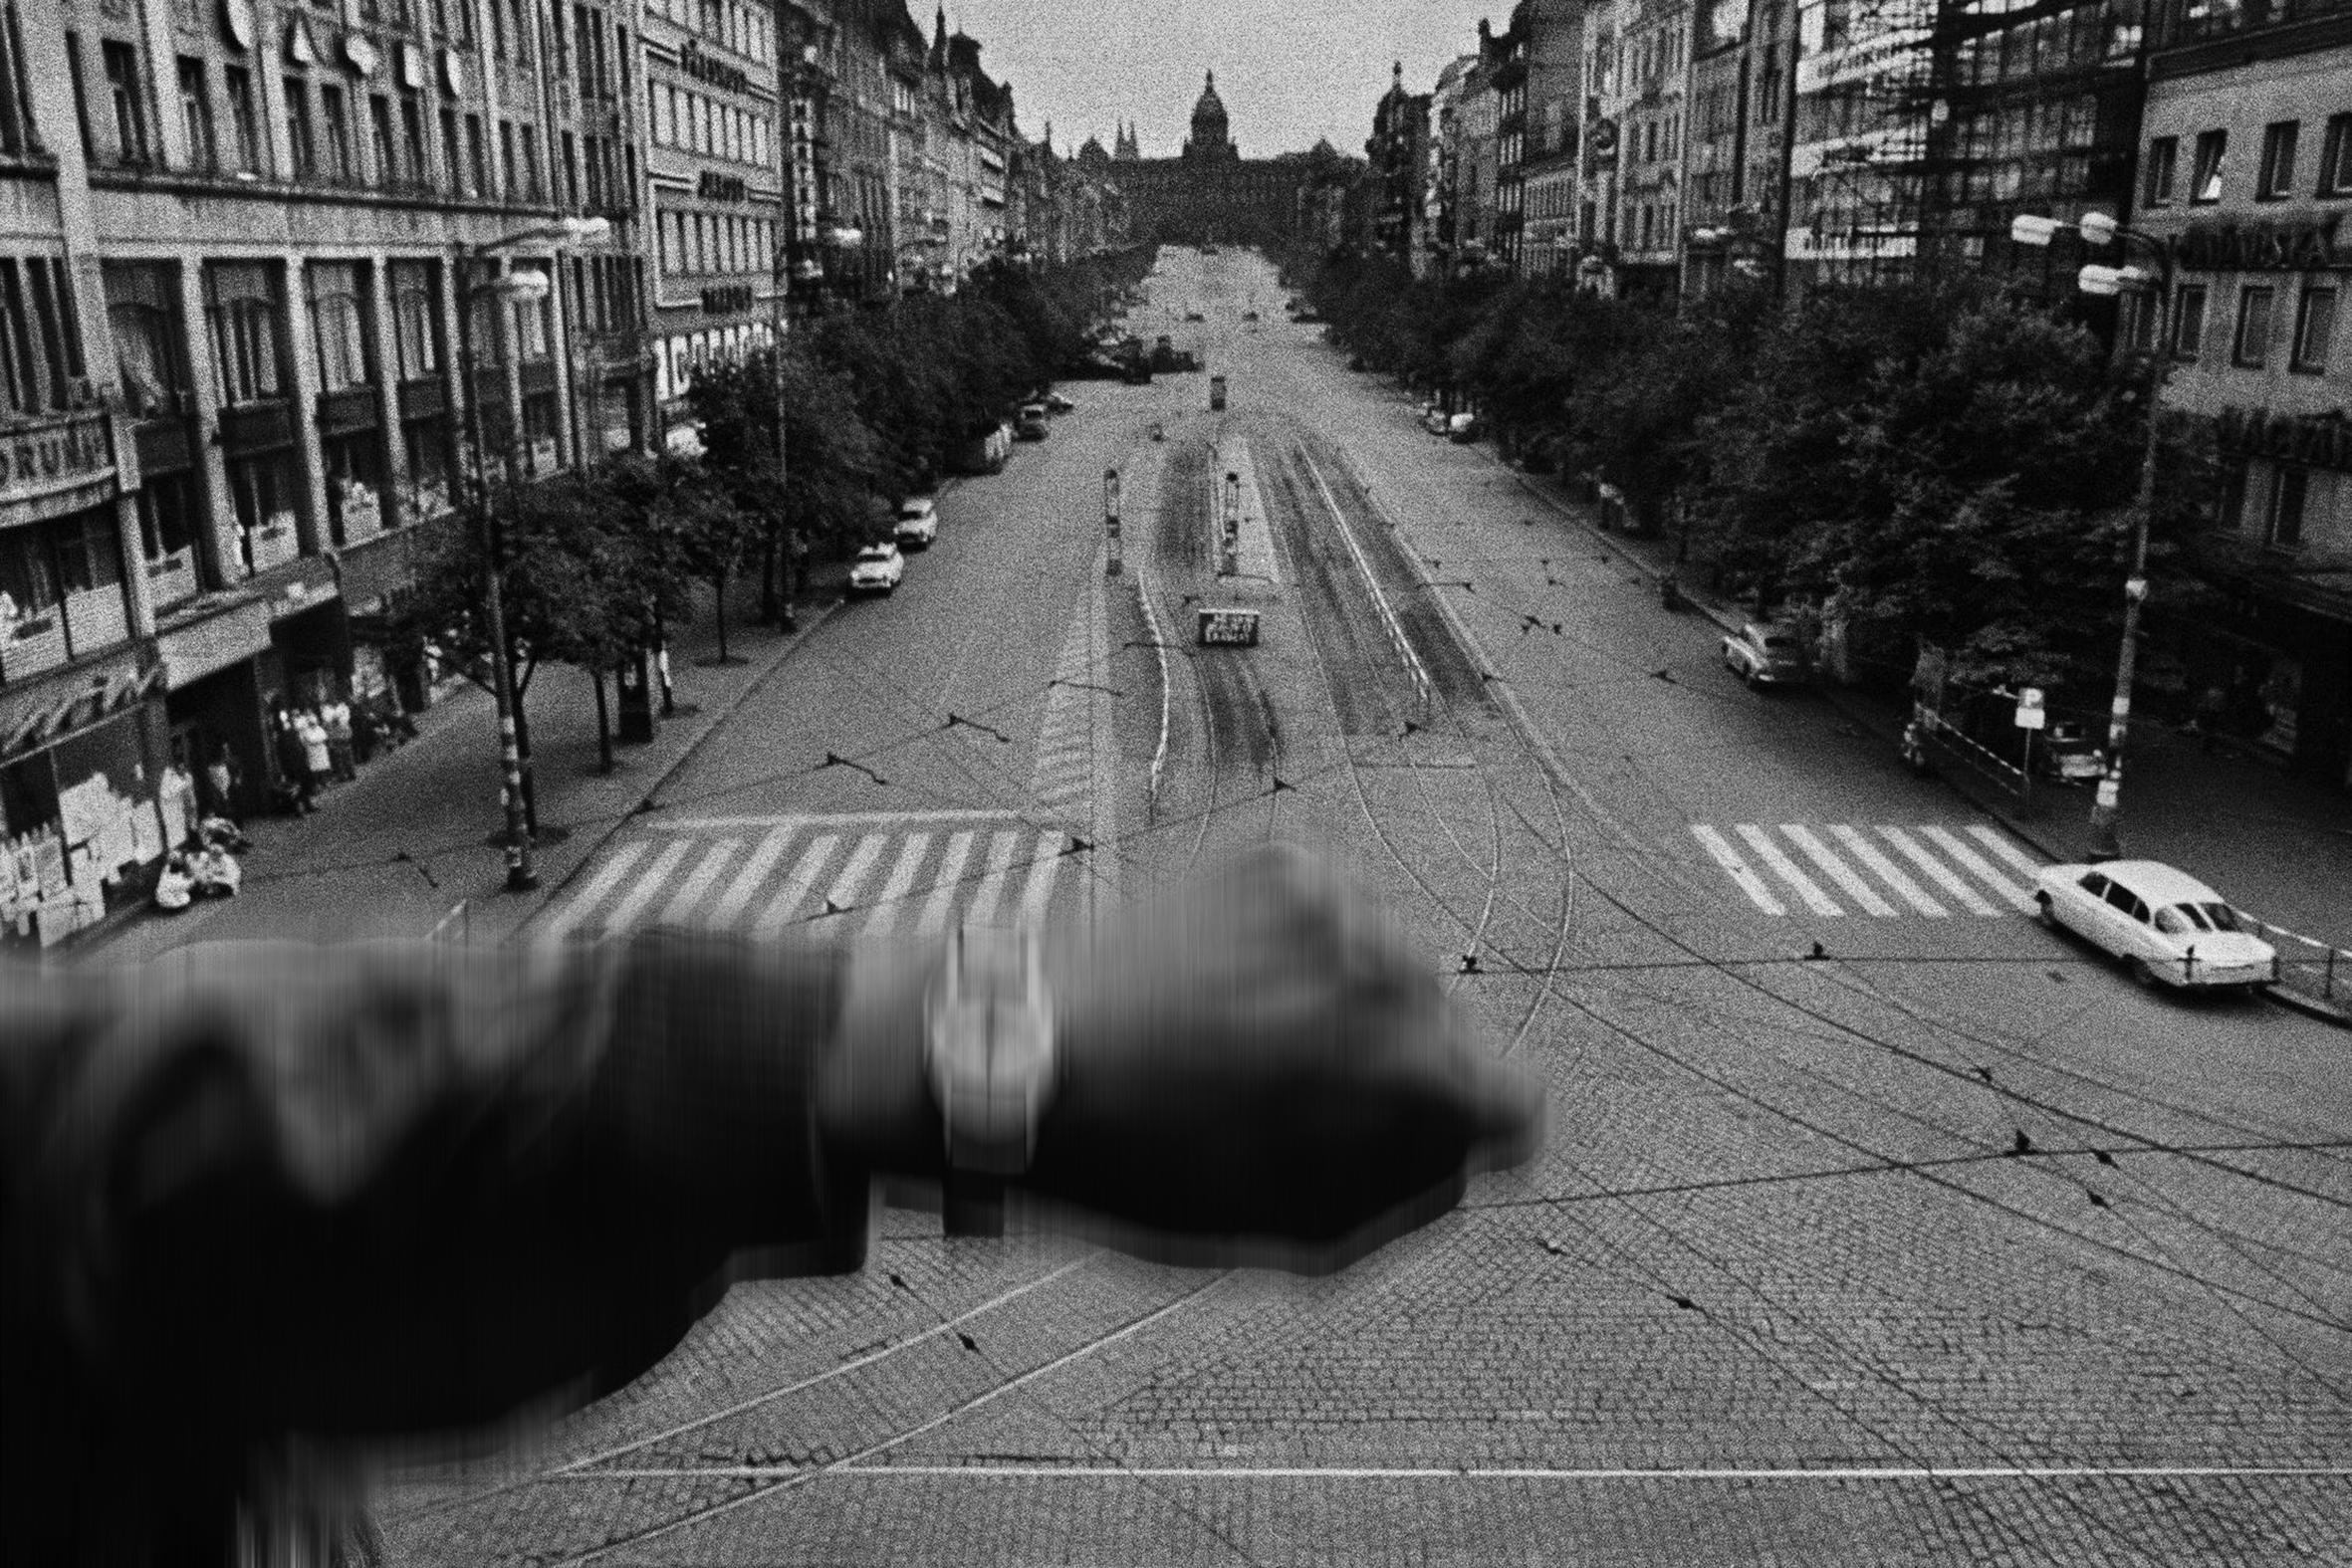 koudelka-prague-68-invasion-wristshot copy.jpg